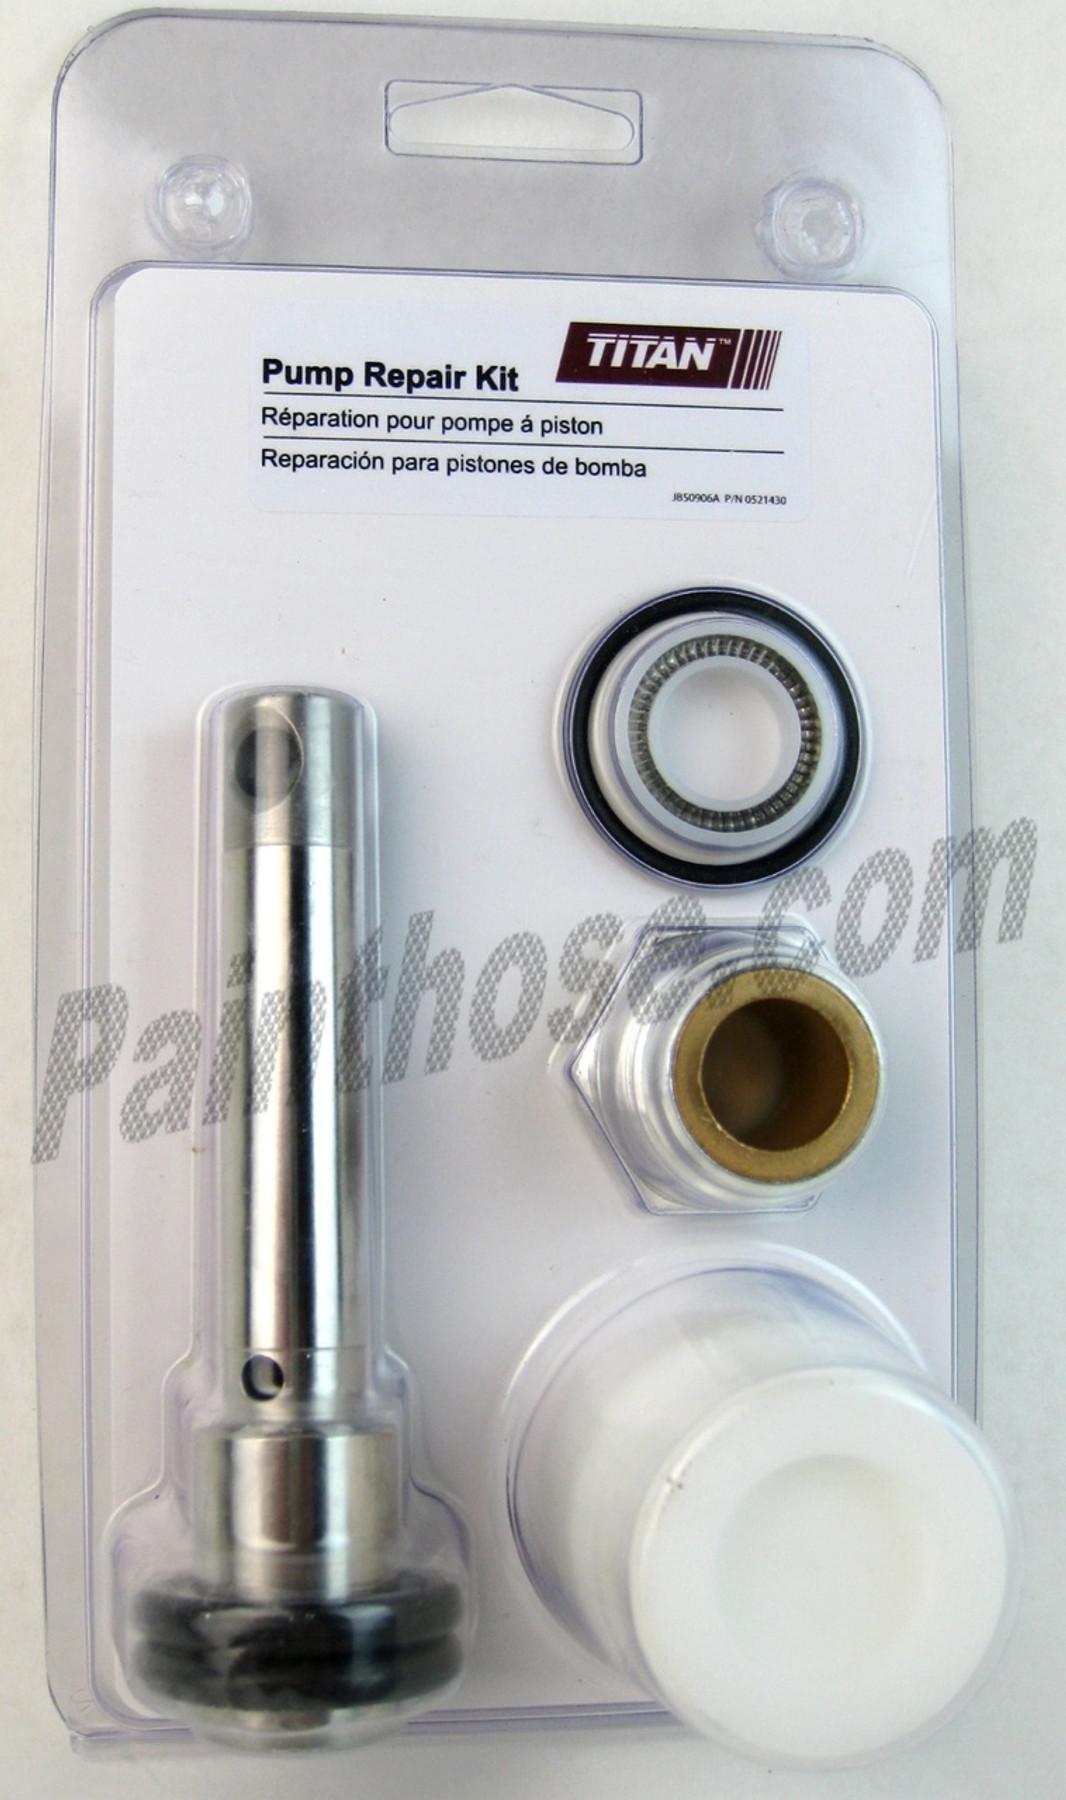 wagner spraytech 0512223 or 512223 repair kit 9170 1700 2120 pf33. Black Bedroom Furniture Sets. Home Design Ideas